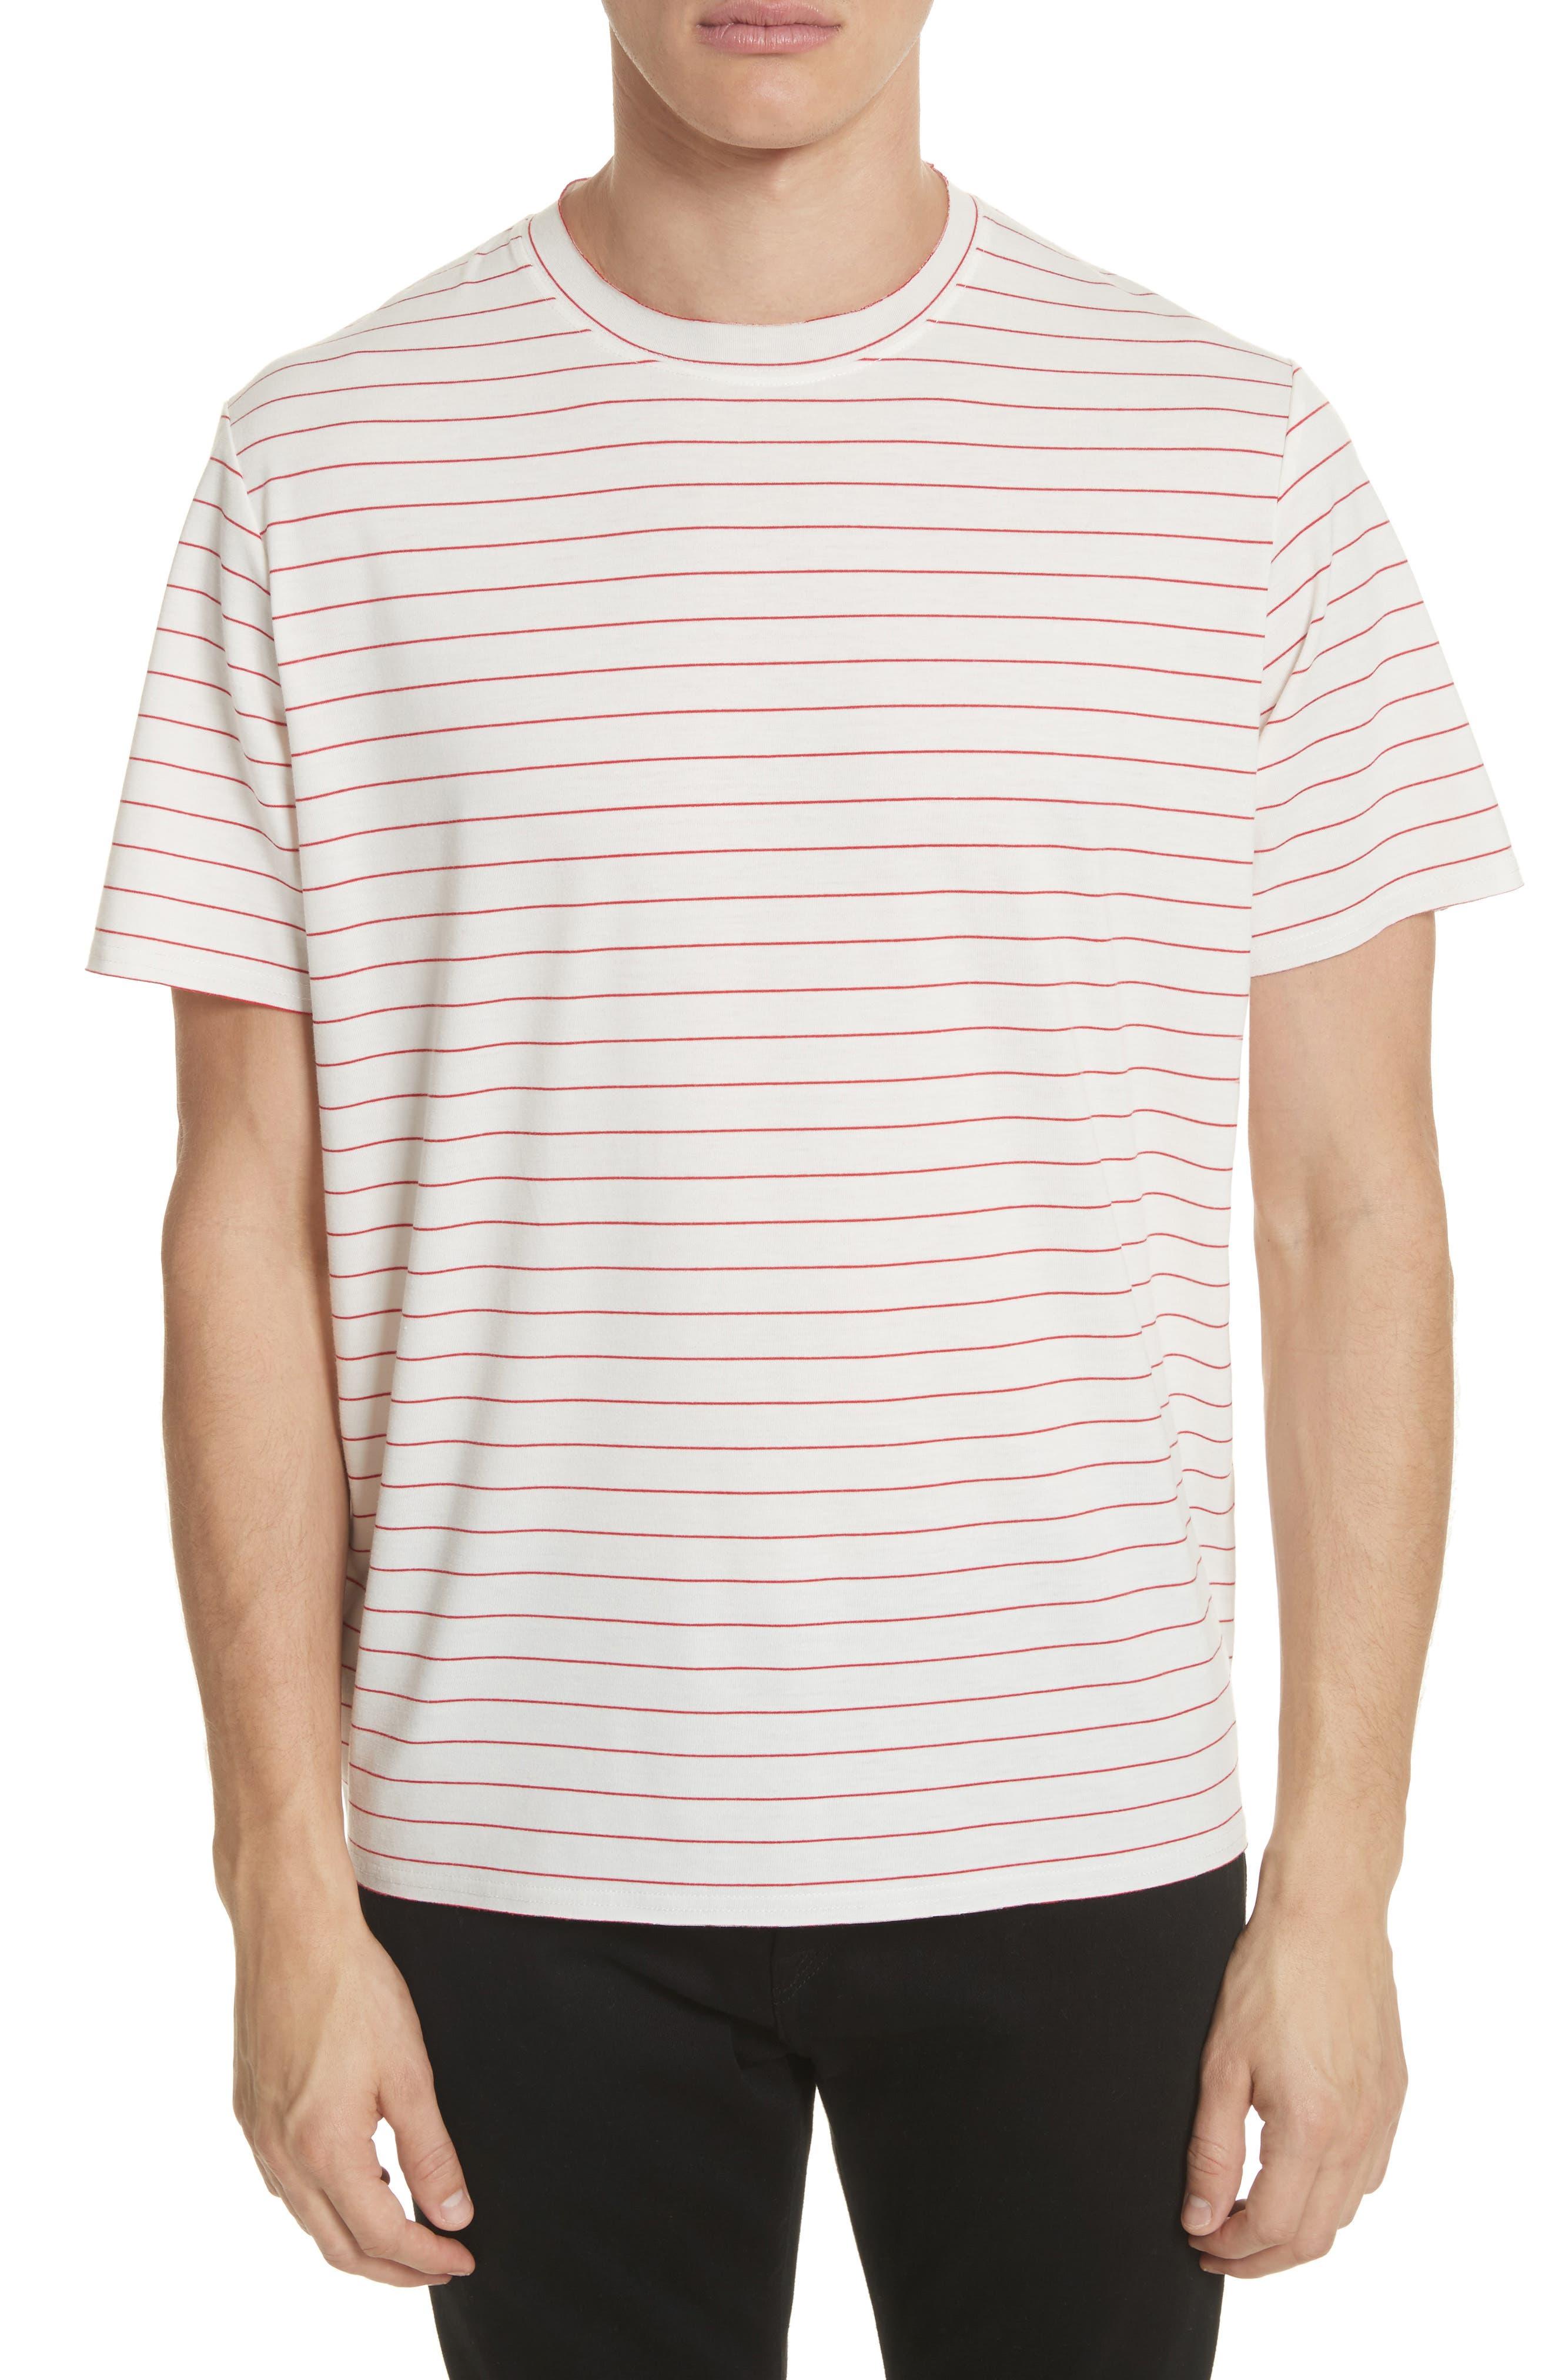 OVADIA & SONS Stripe Crewneck T-Shirt